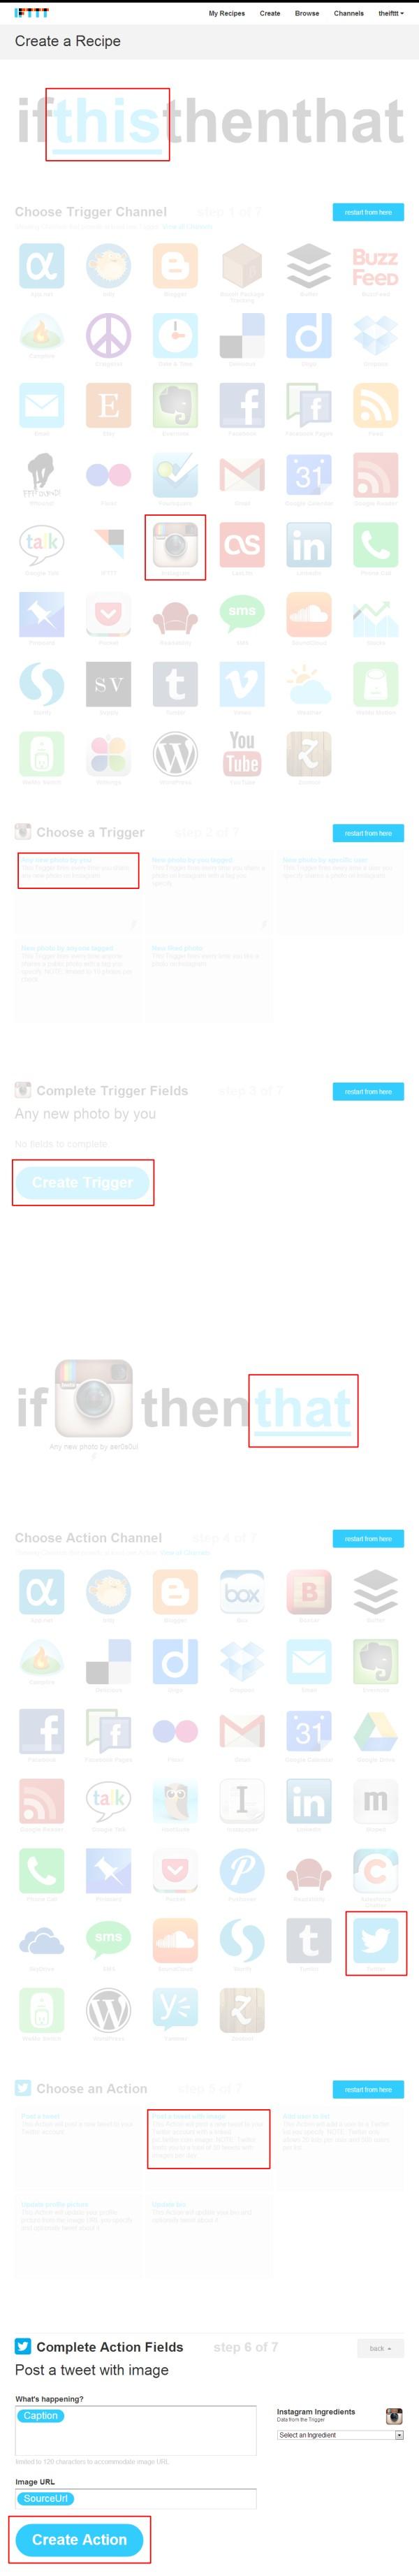 IFTTT - Instagram to Twitter Tutorial